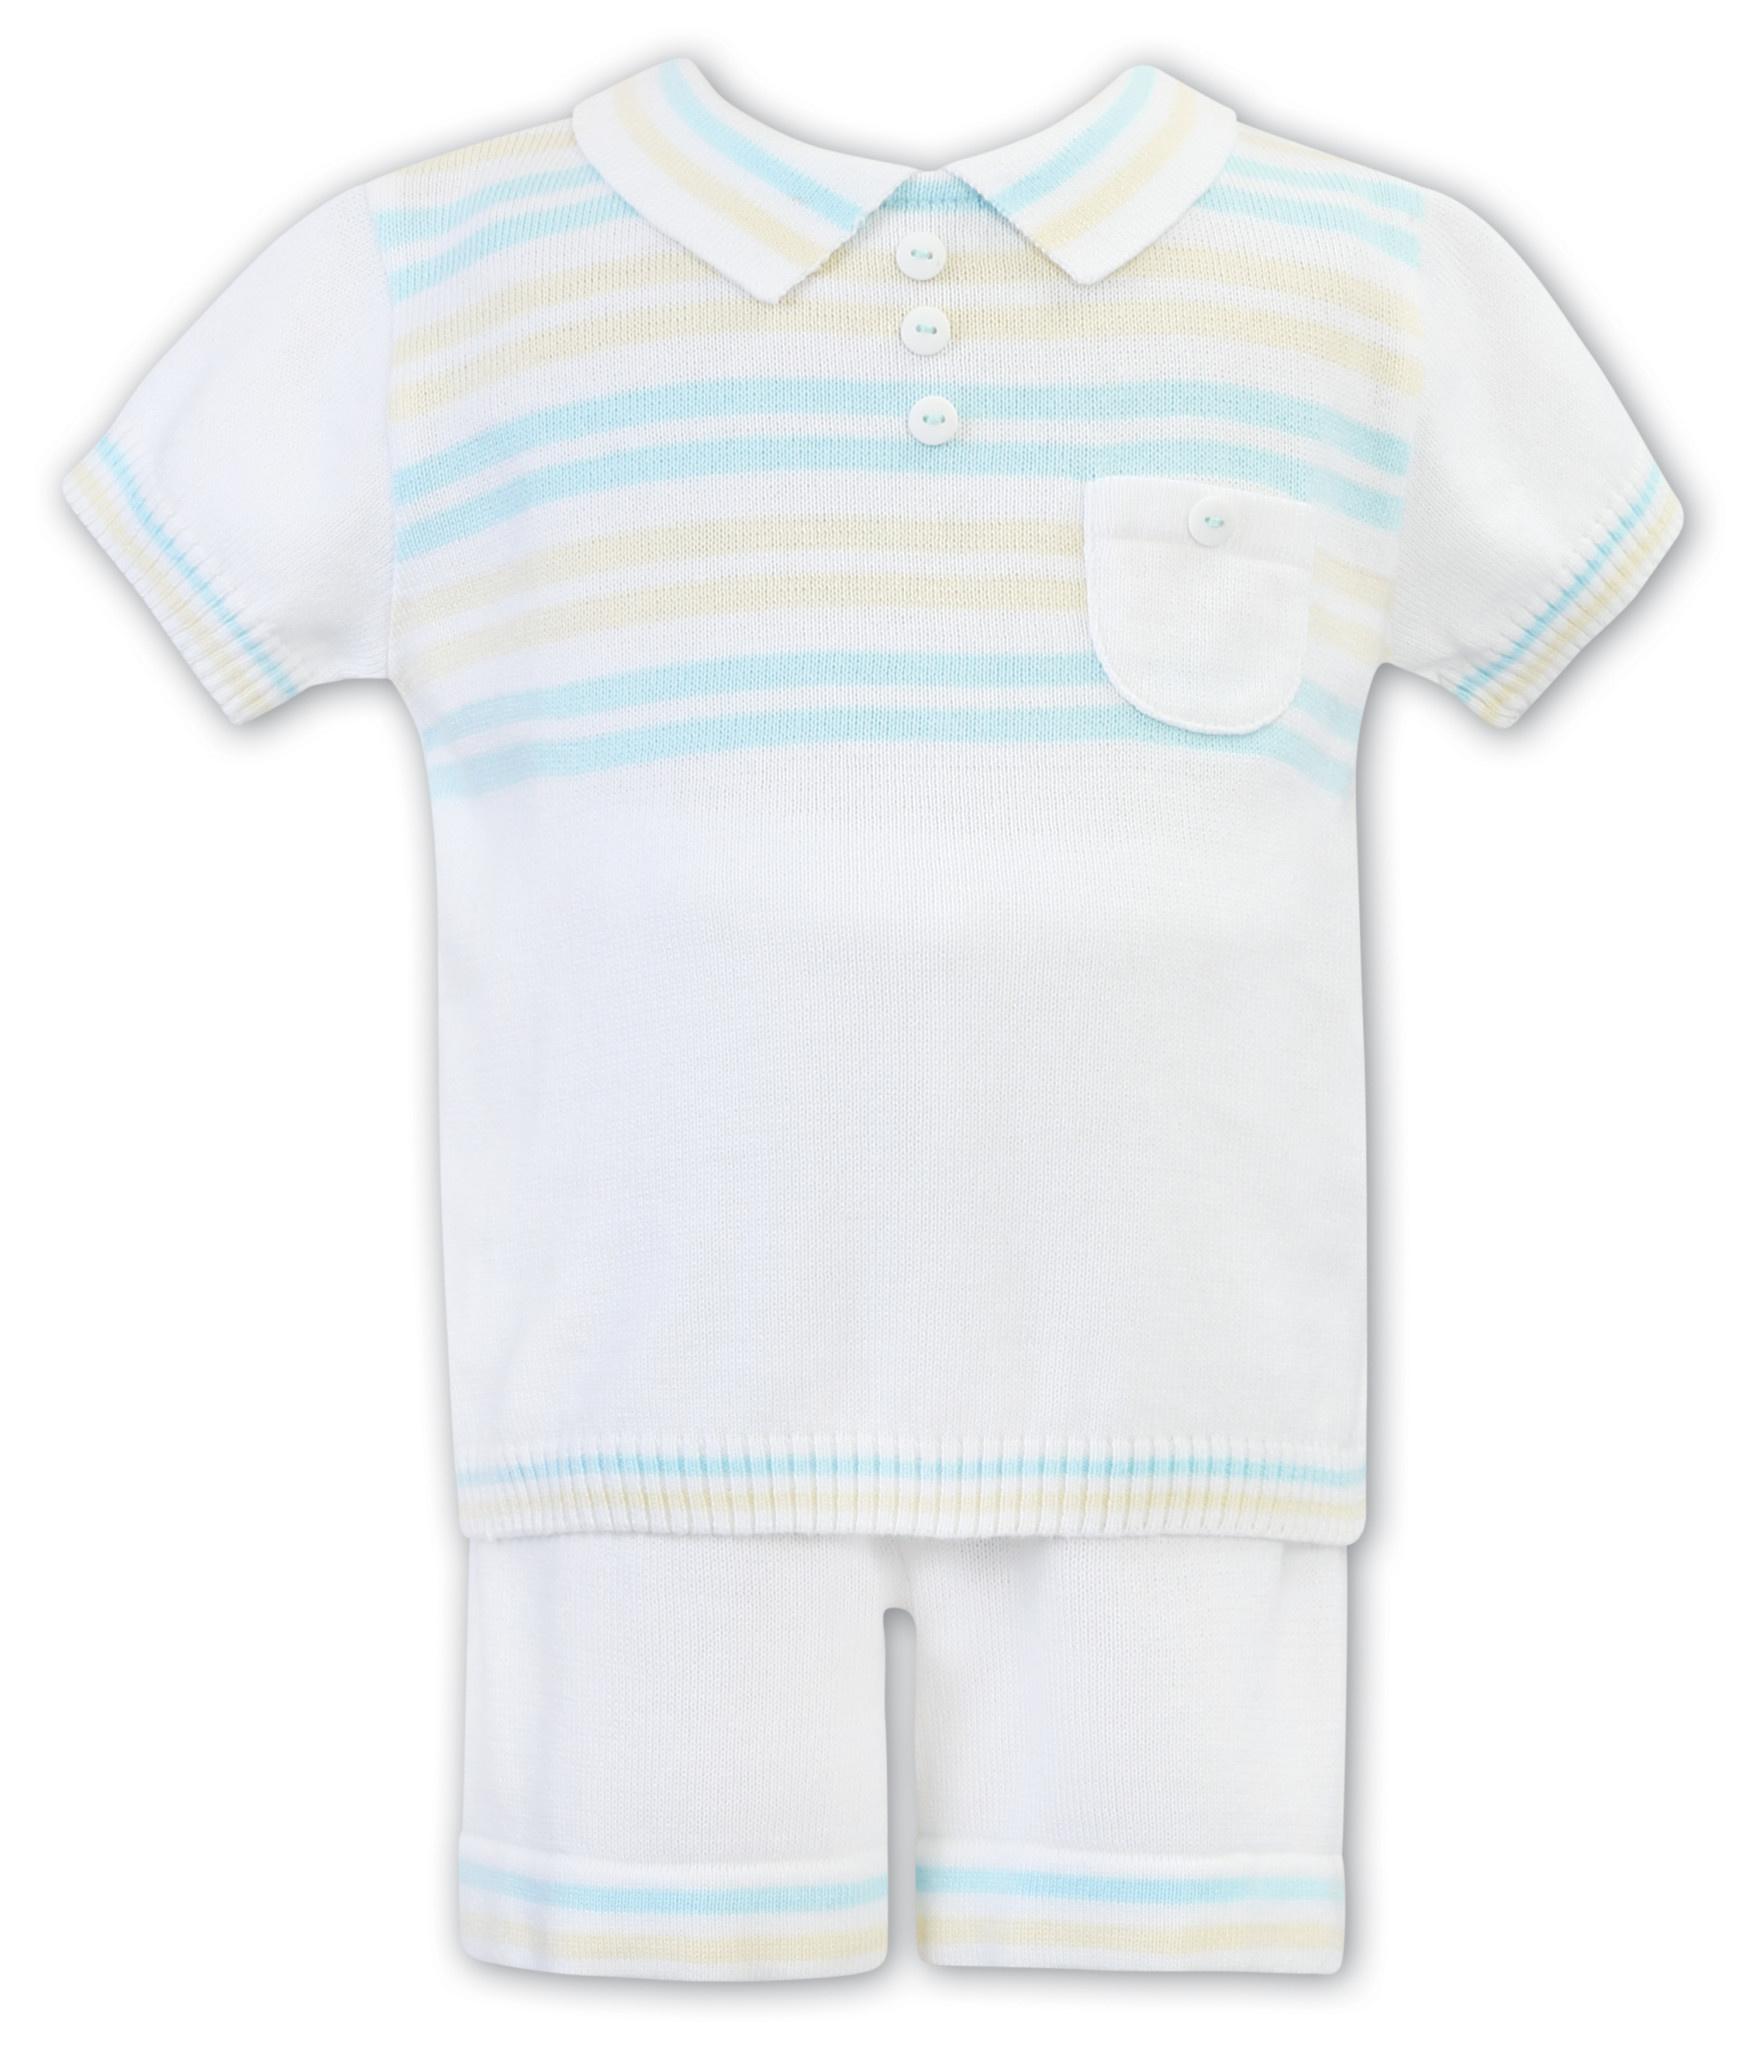 Sarah Louise Sarah Louise Boys Knitted White Short Set